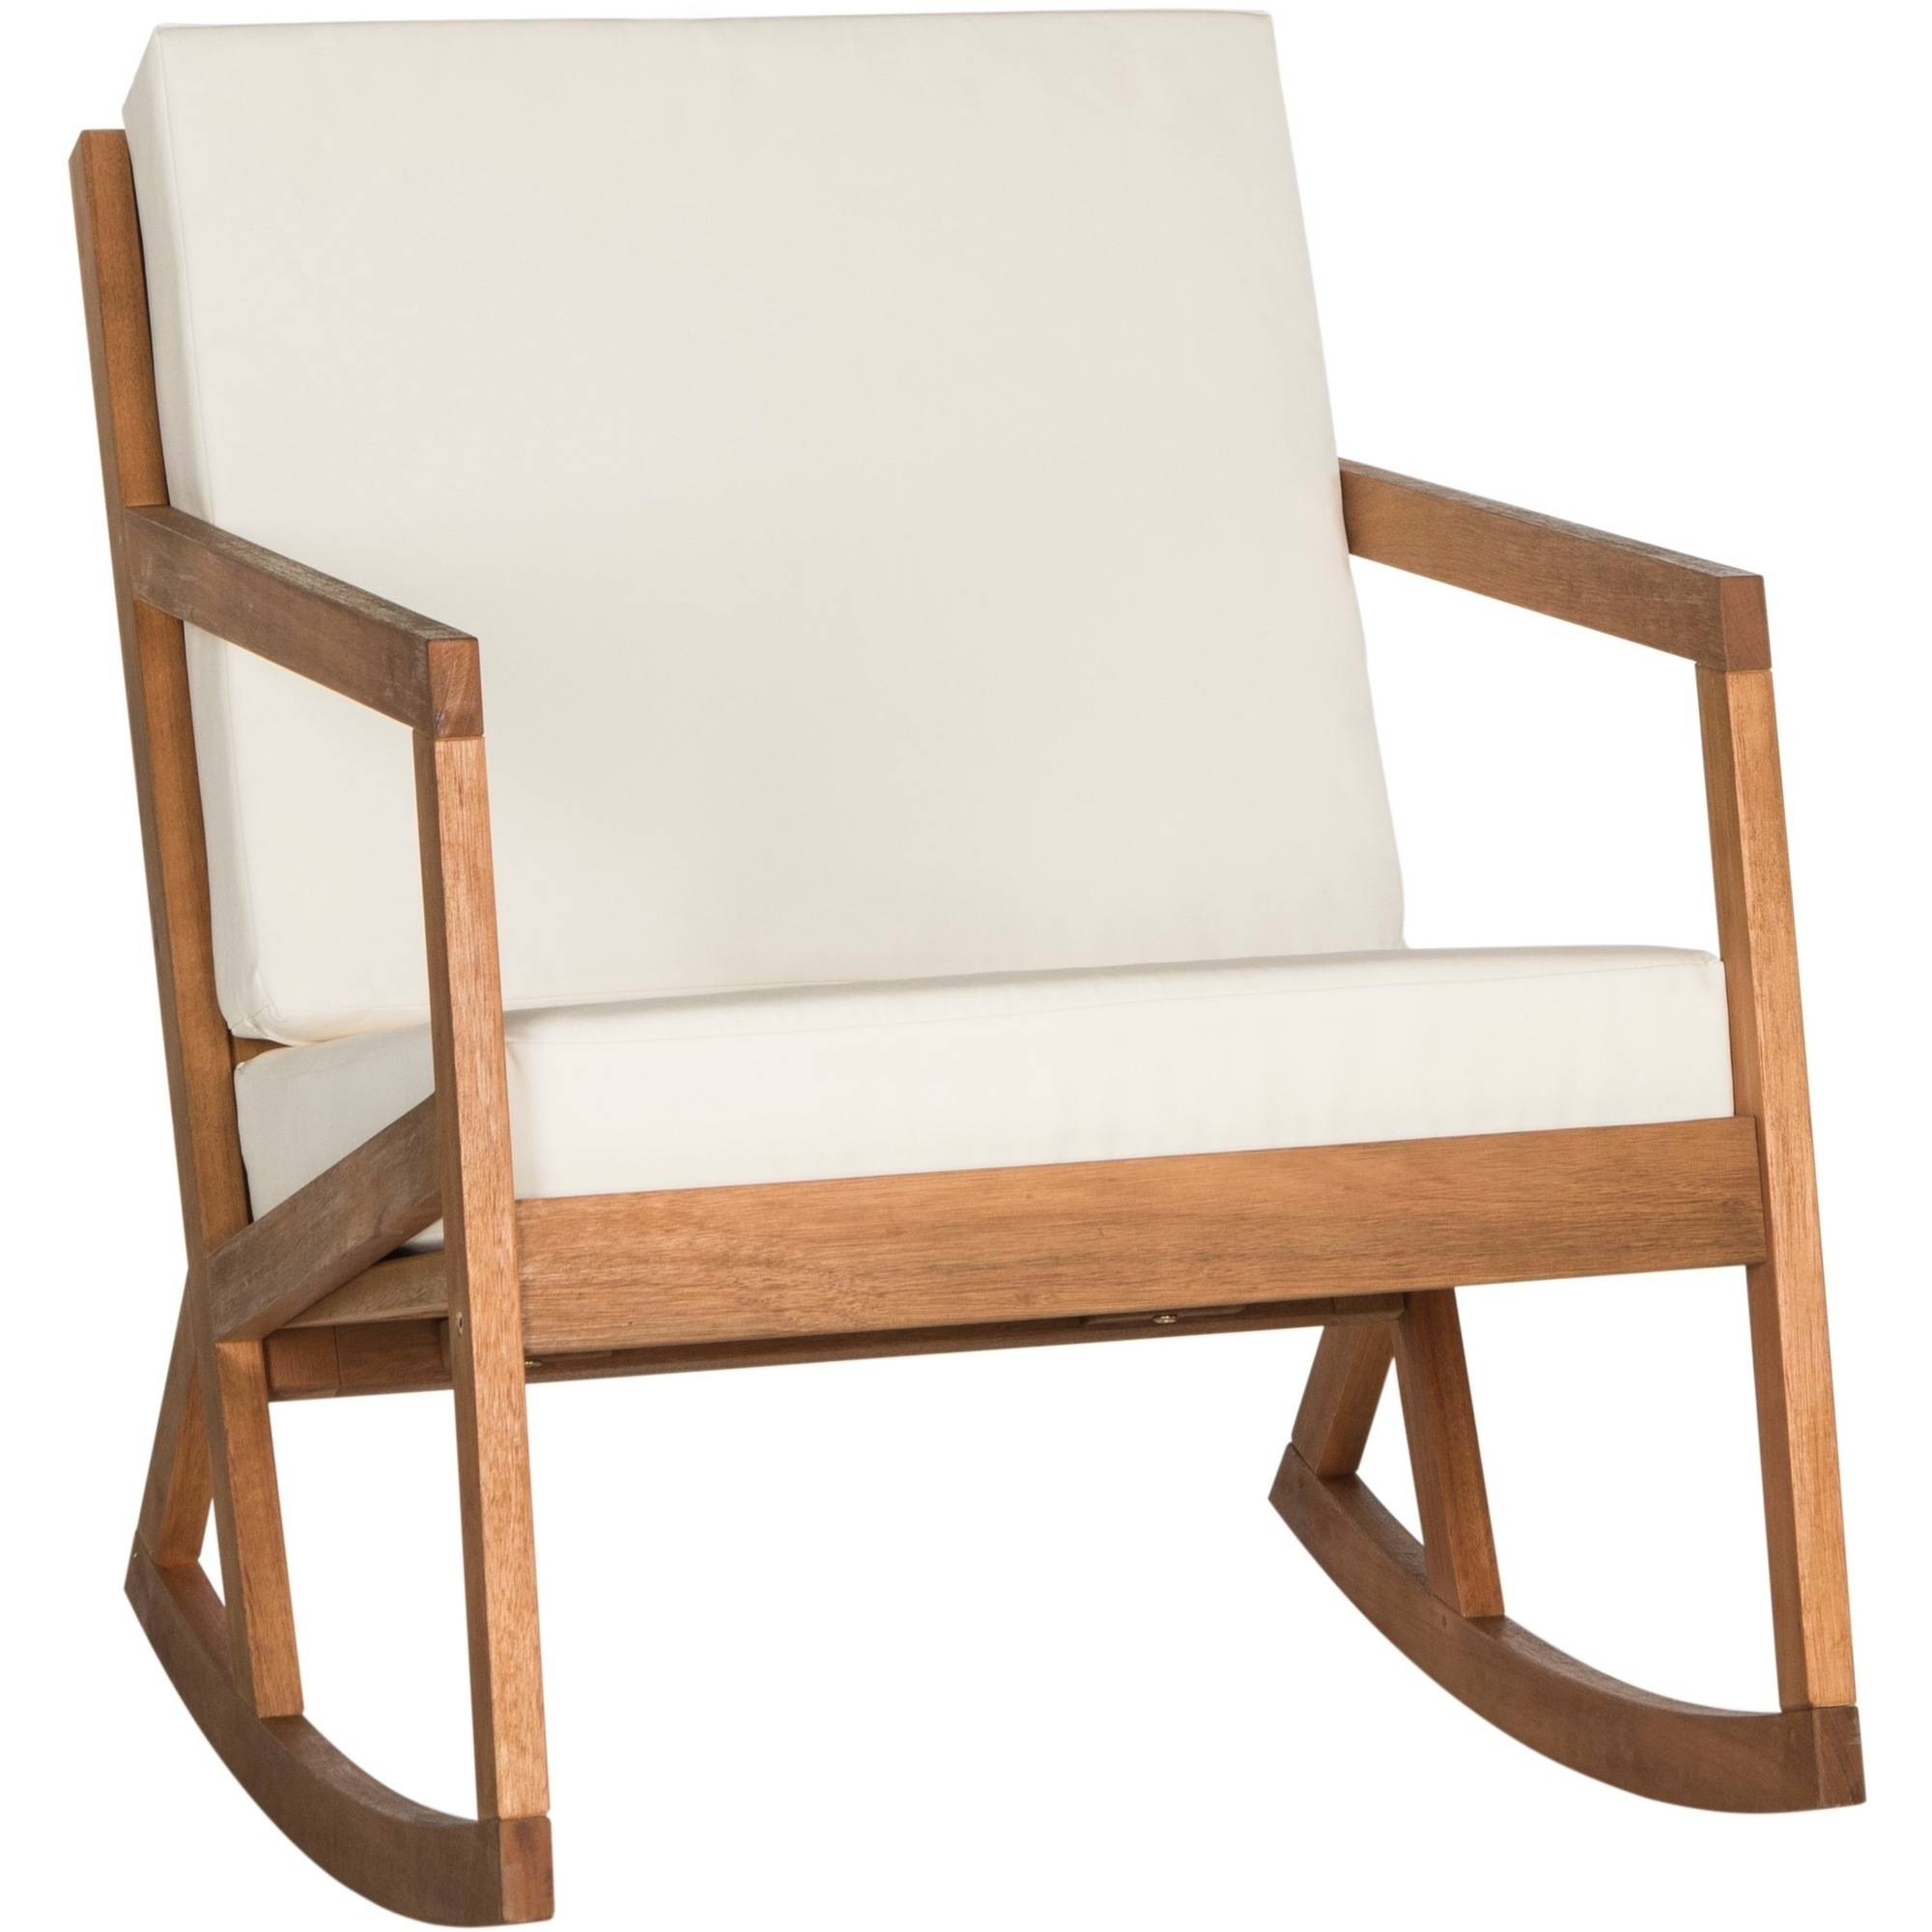 Safavieh Vernon Rocking Chair, Multiple Colors   Walmart.com